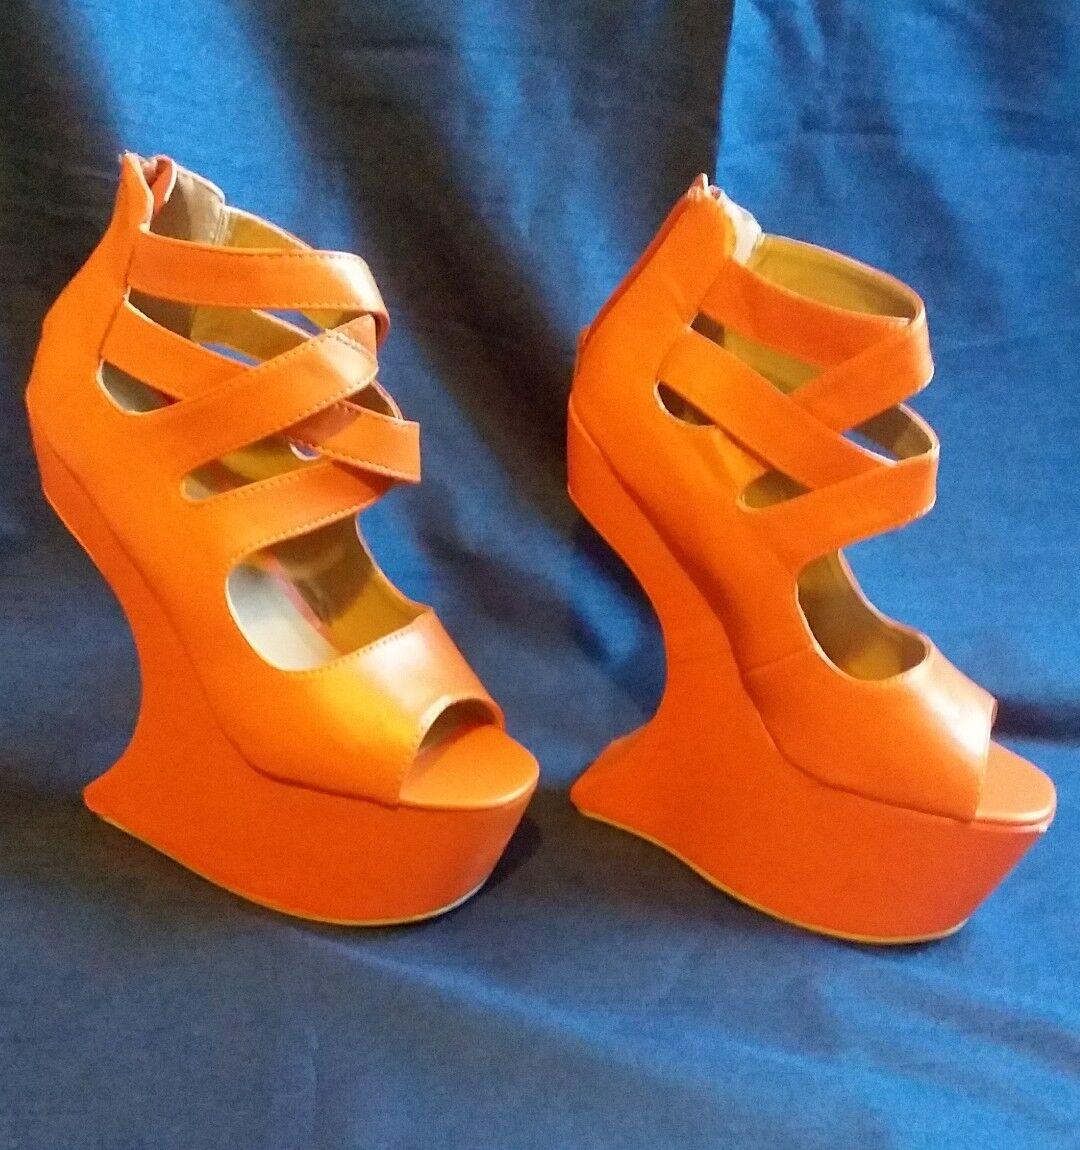 Bumper Cross Orange Heel Less Criss Cross Bumper Curved Wedge Peep toe bb6184